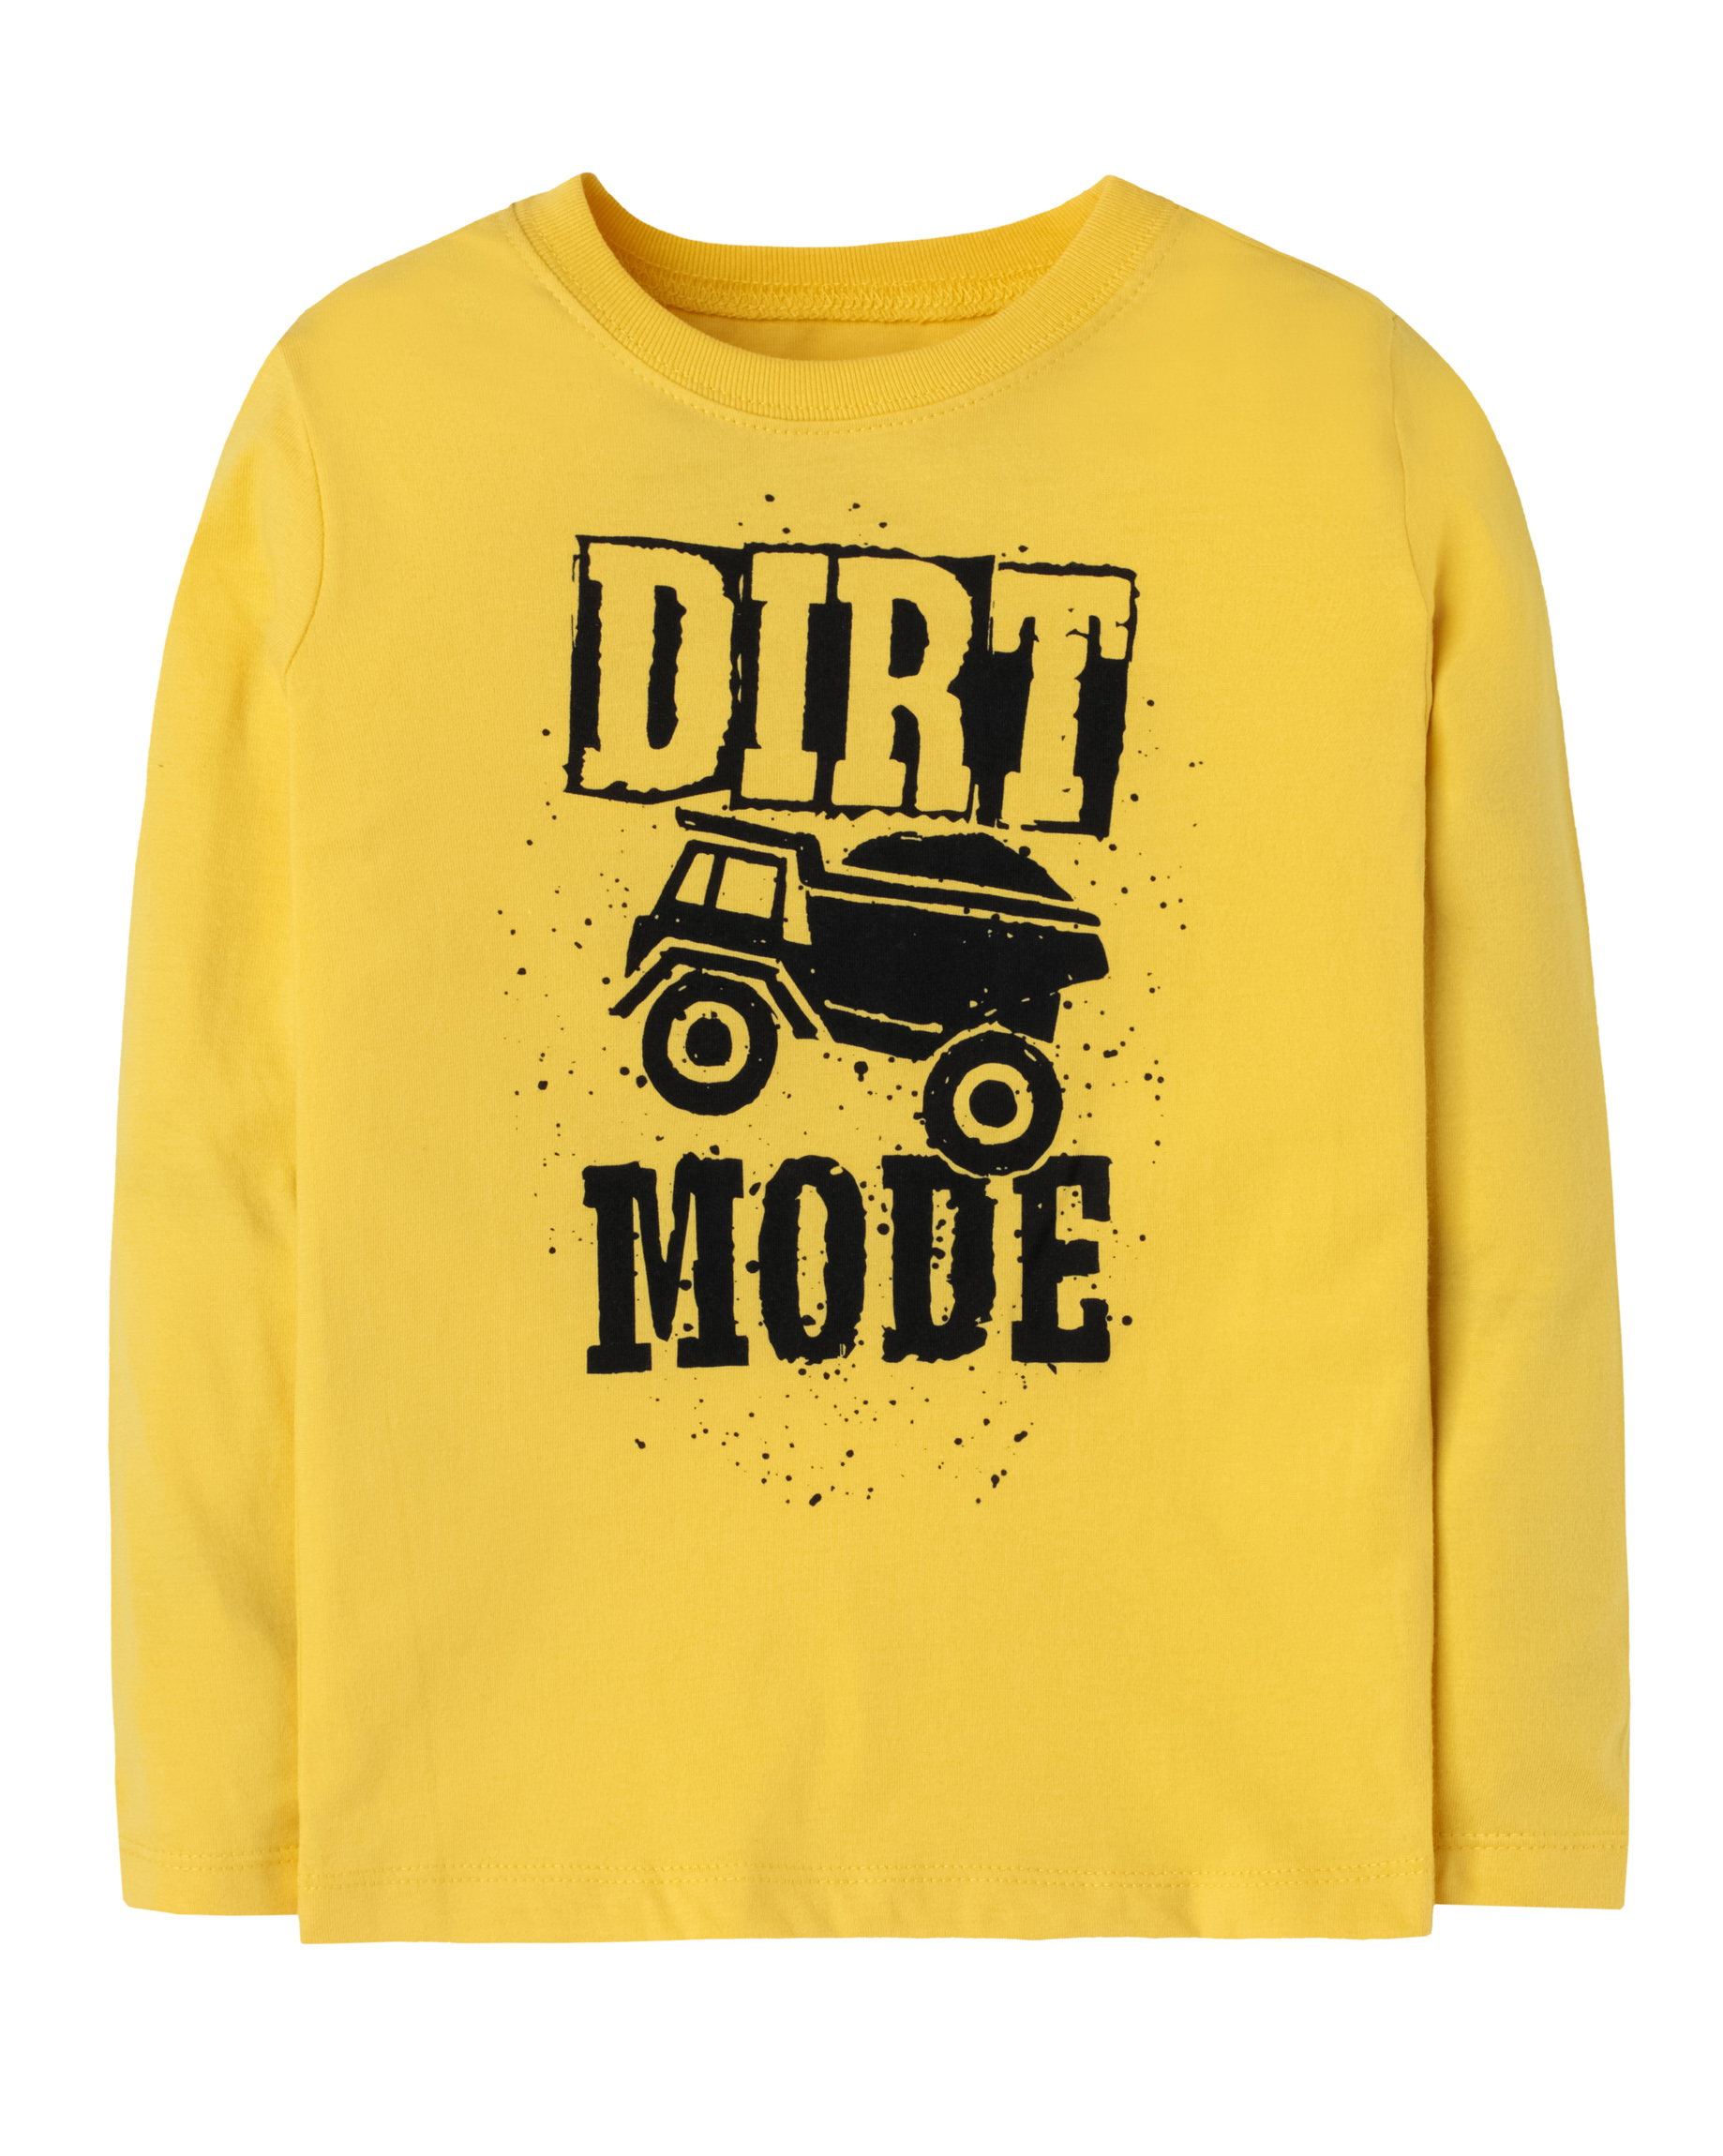 DIRT MODE חולצת